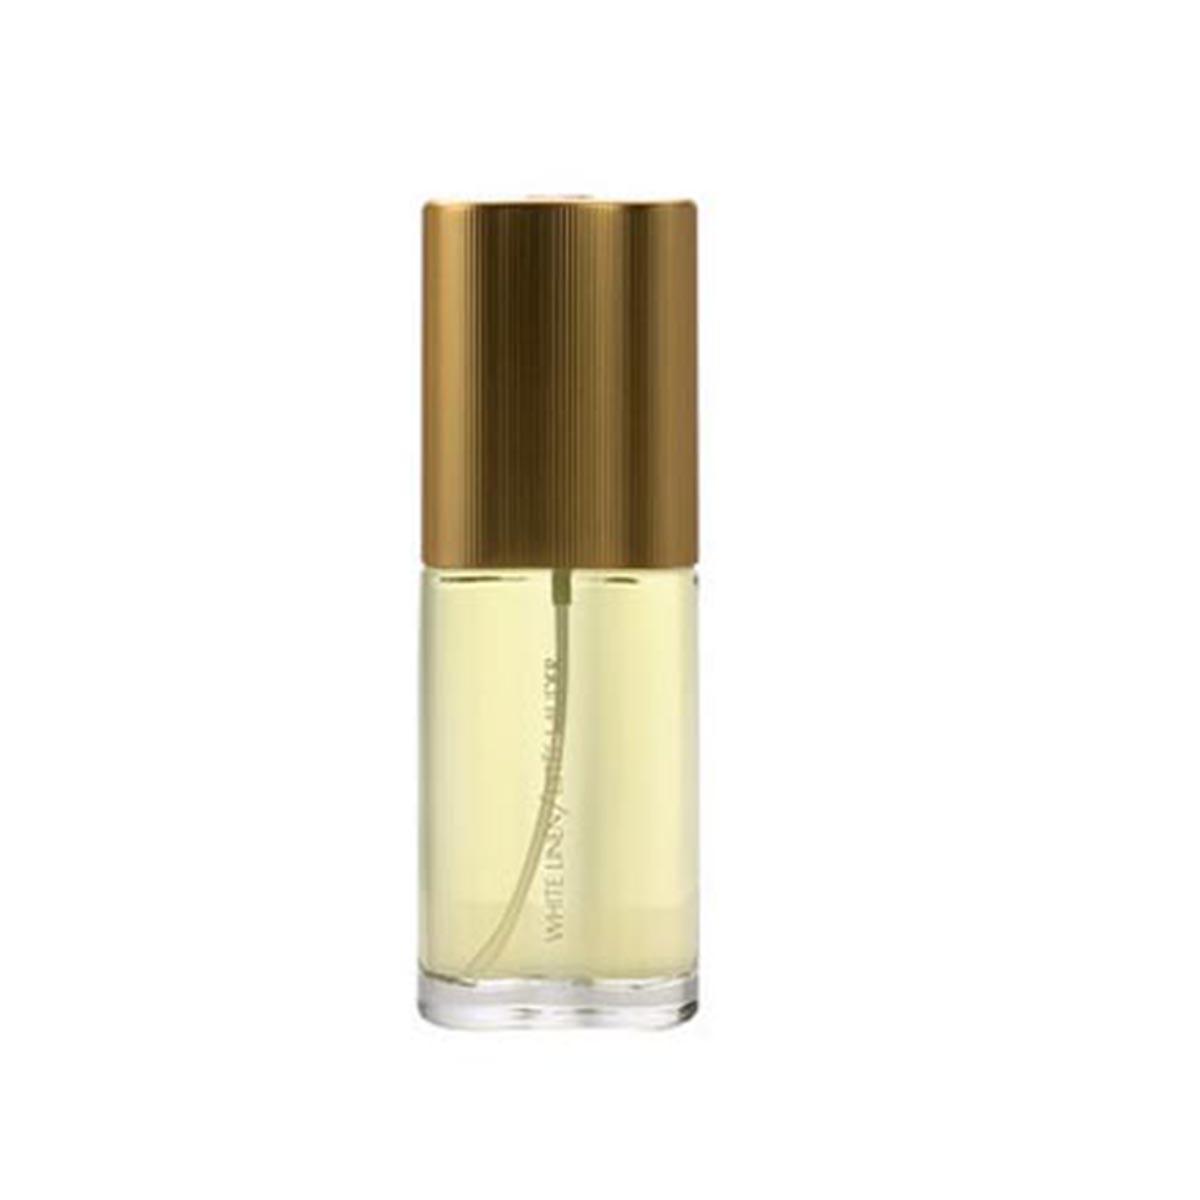 Estee lauder white linen eau de parfum 60ml vaporizador